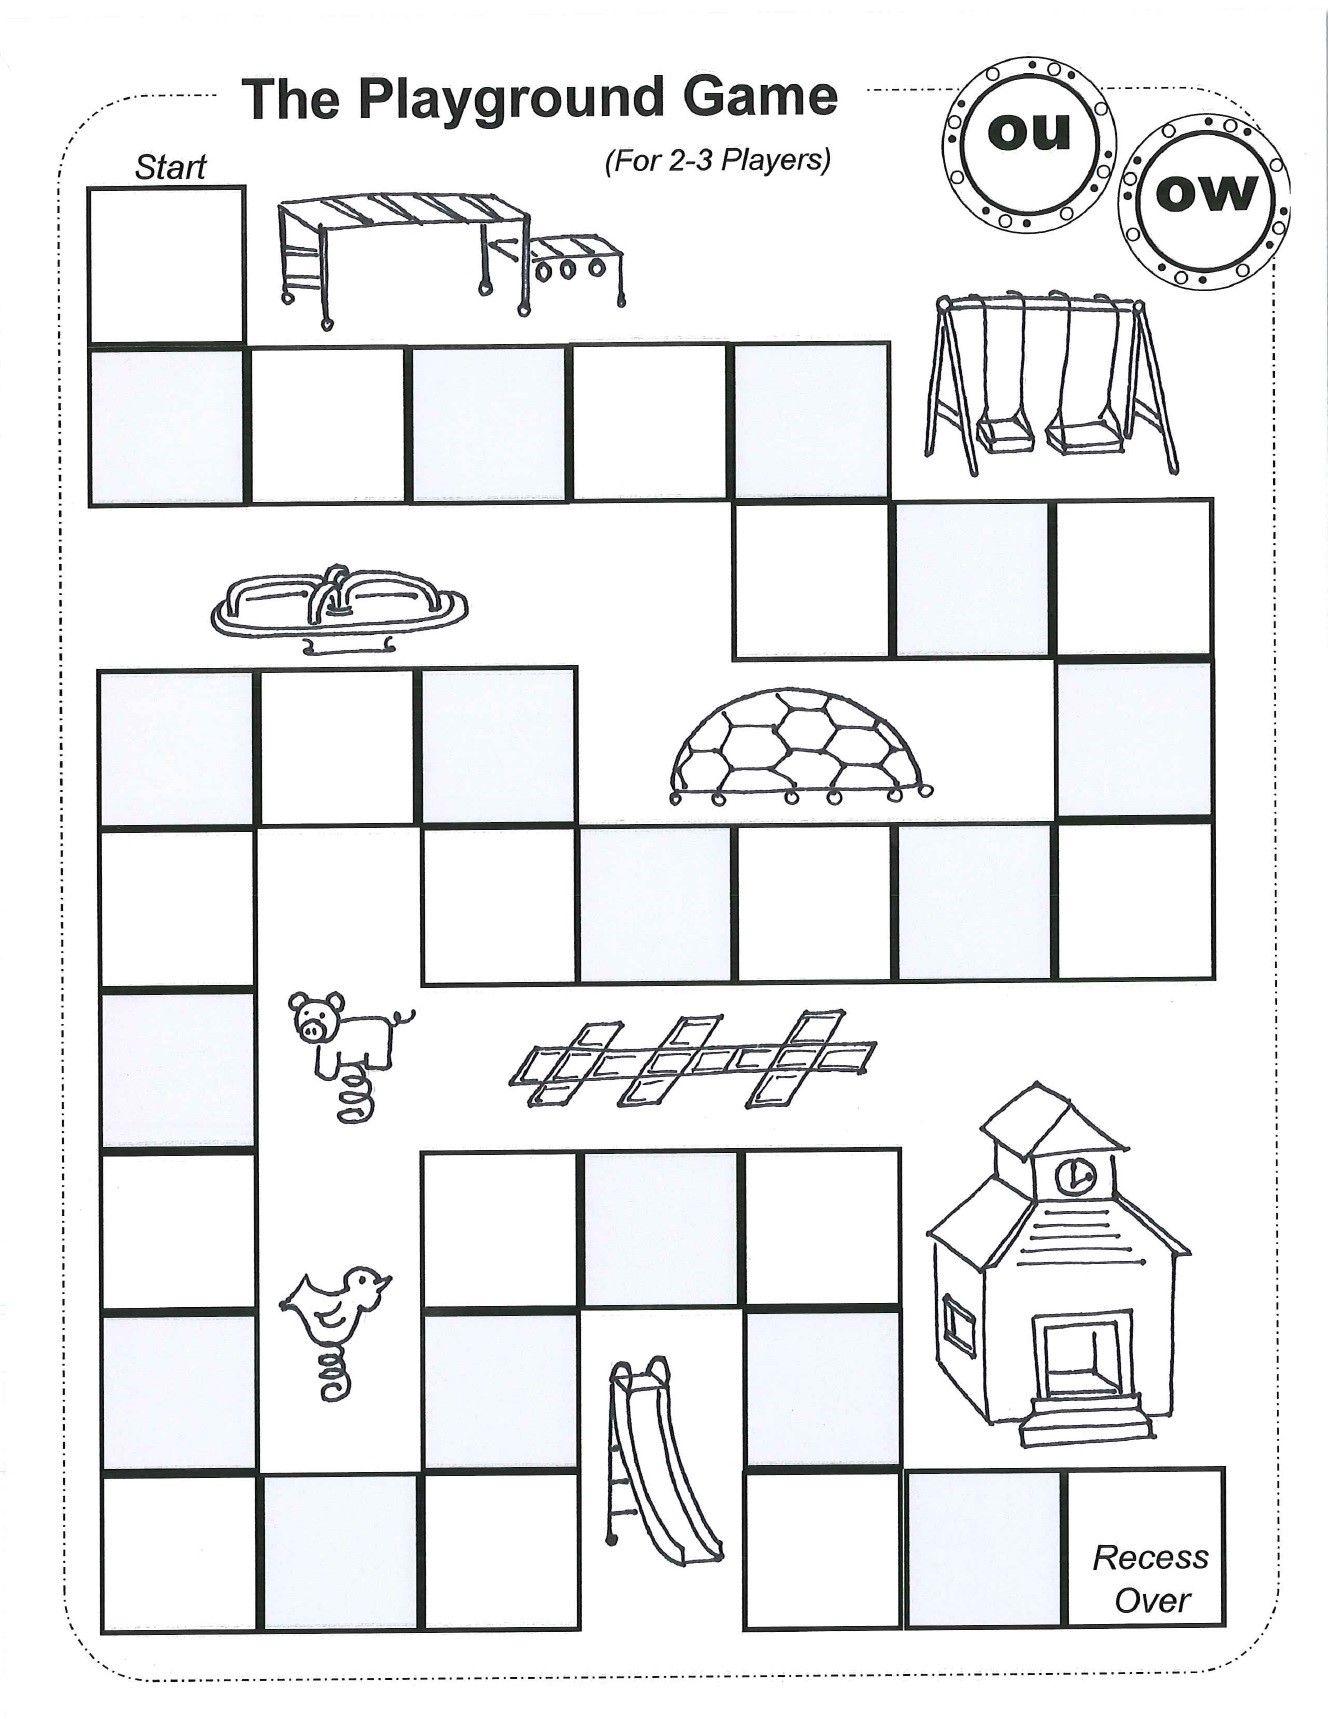 Vowel Diphthongs Original Poems Worksheets And Game Boards Diphthongs Vowel Diphthongs Diphthong Words